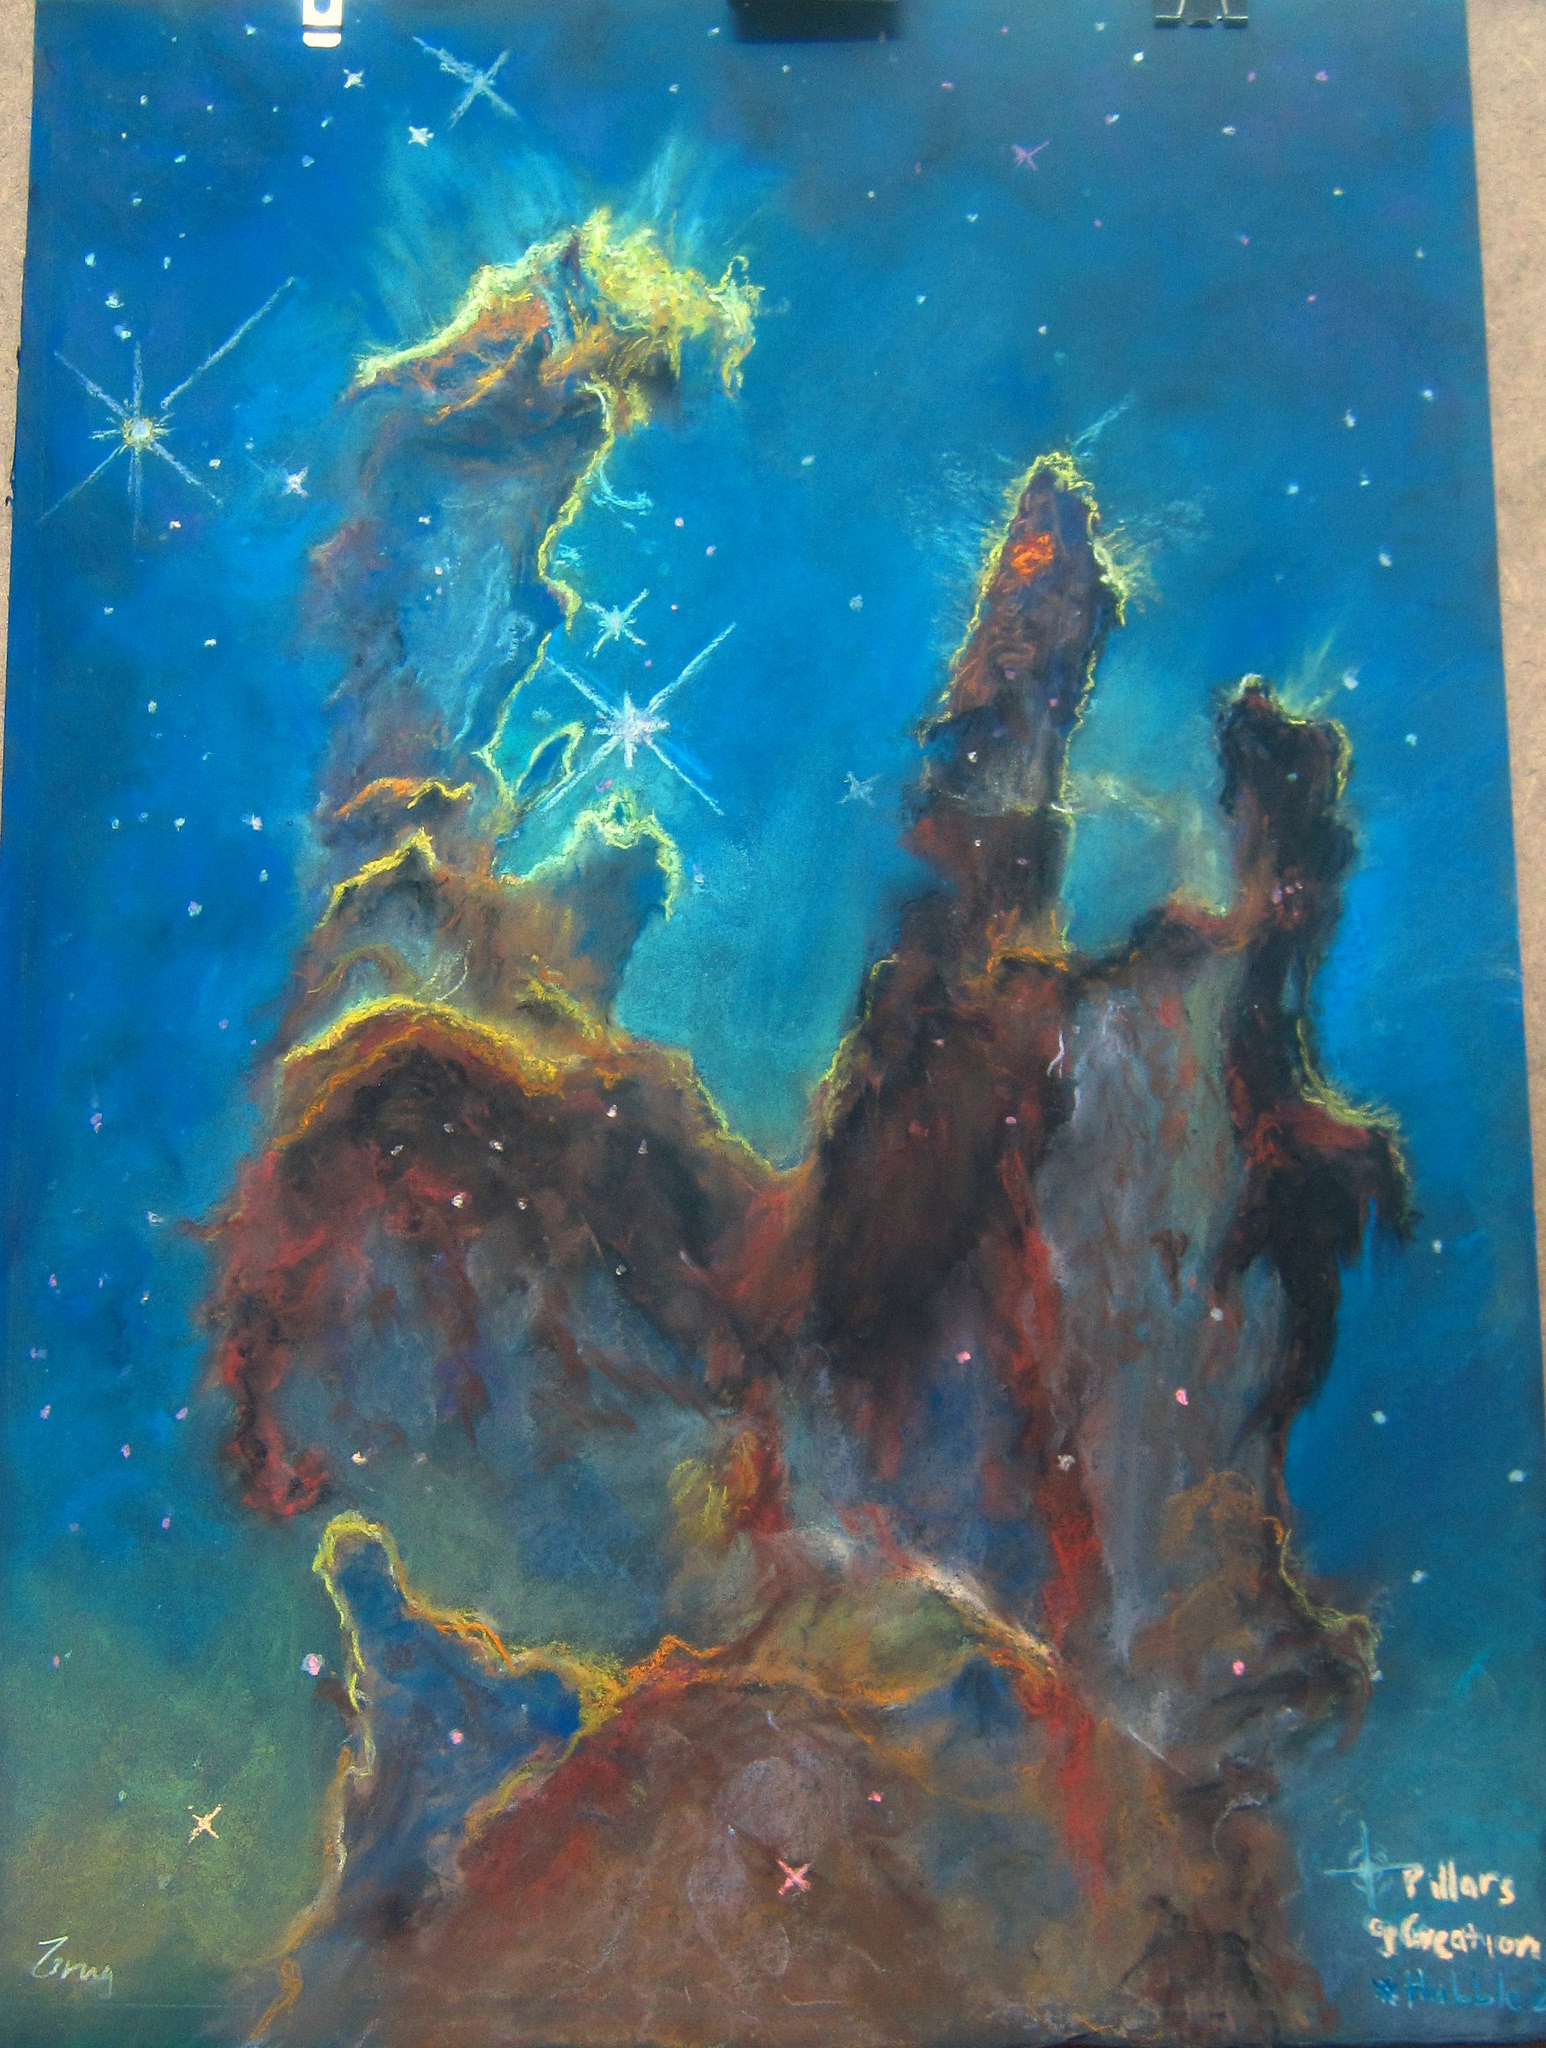 Pillars of Creation recreated